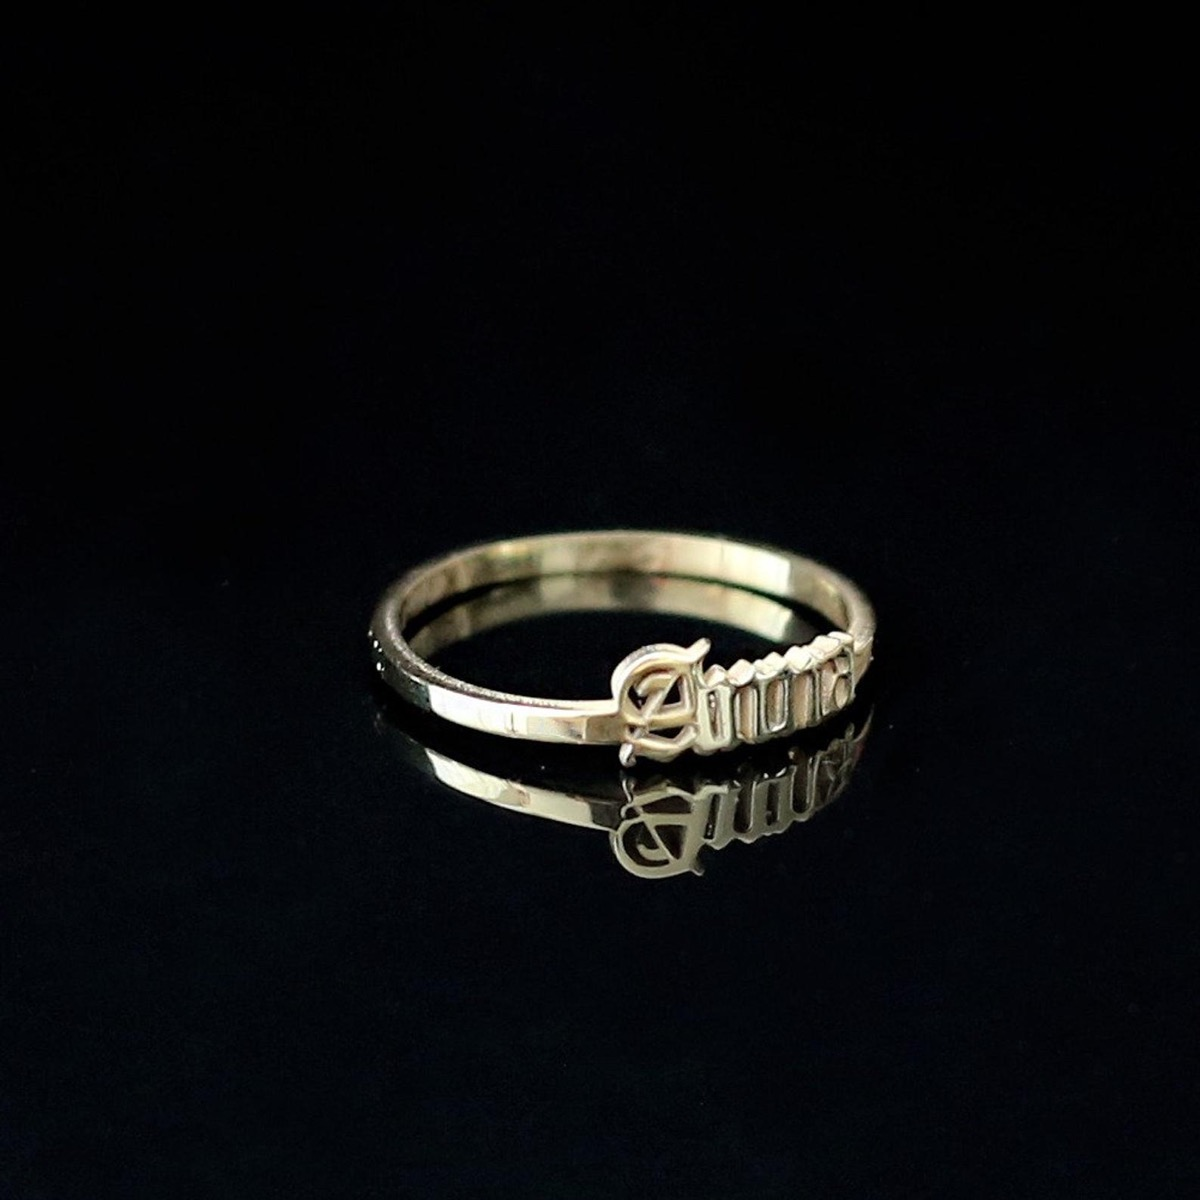 Gold gothic name ring, black background